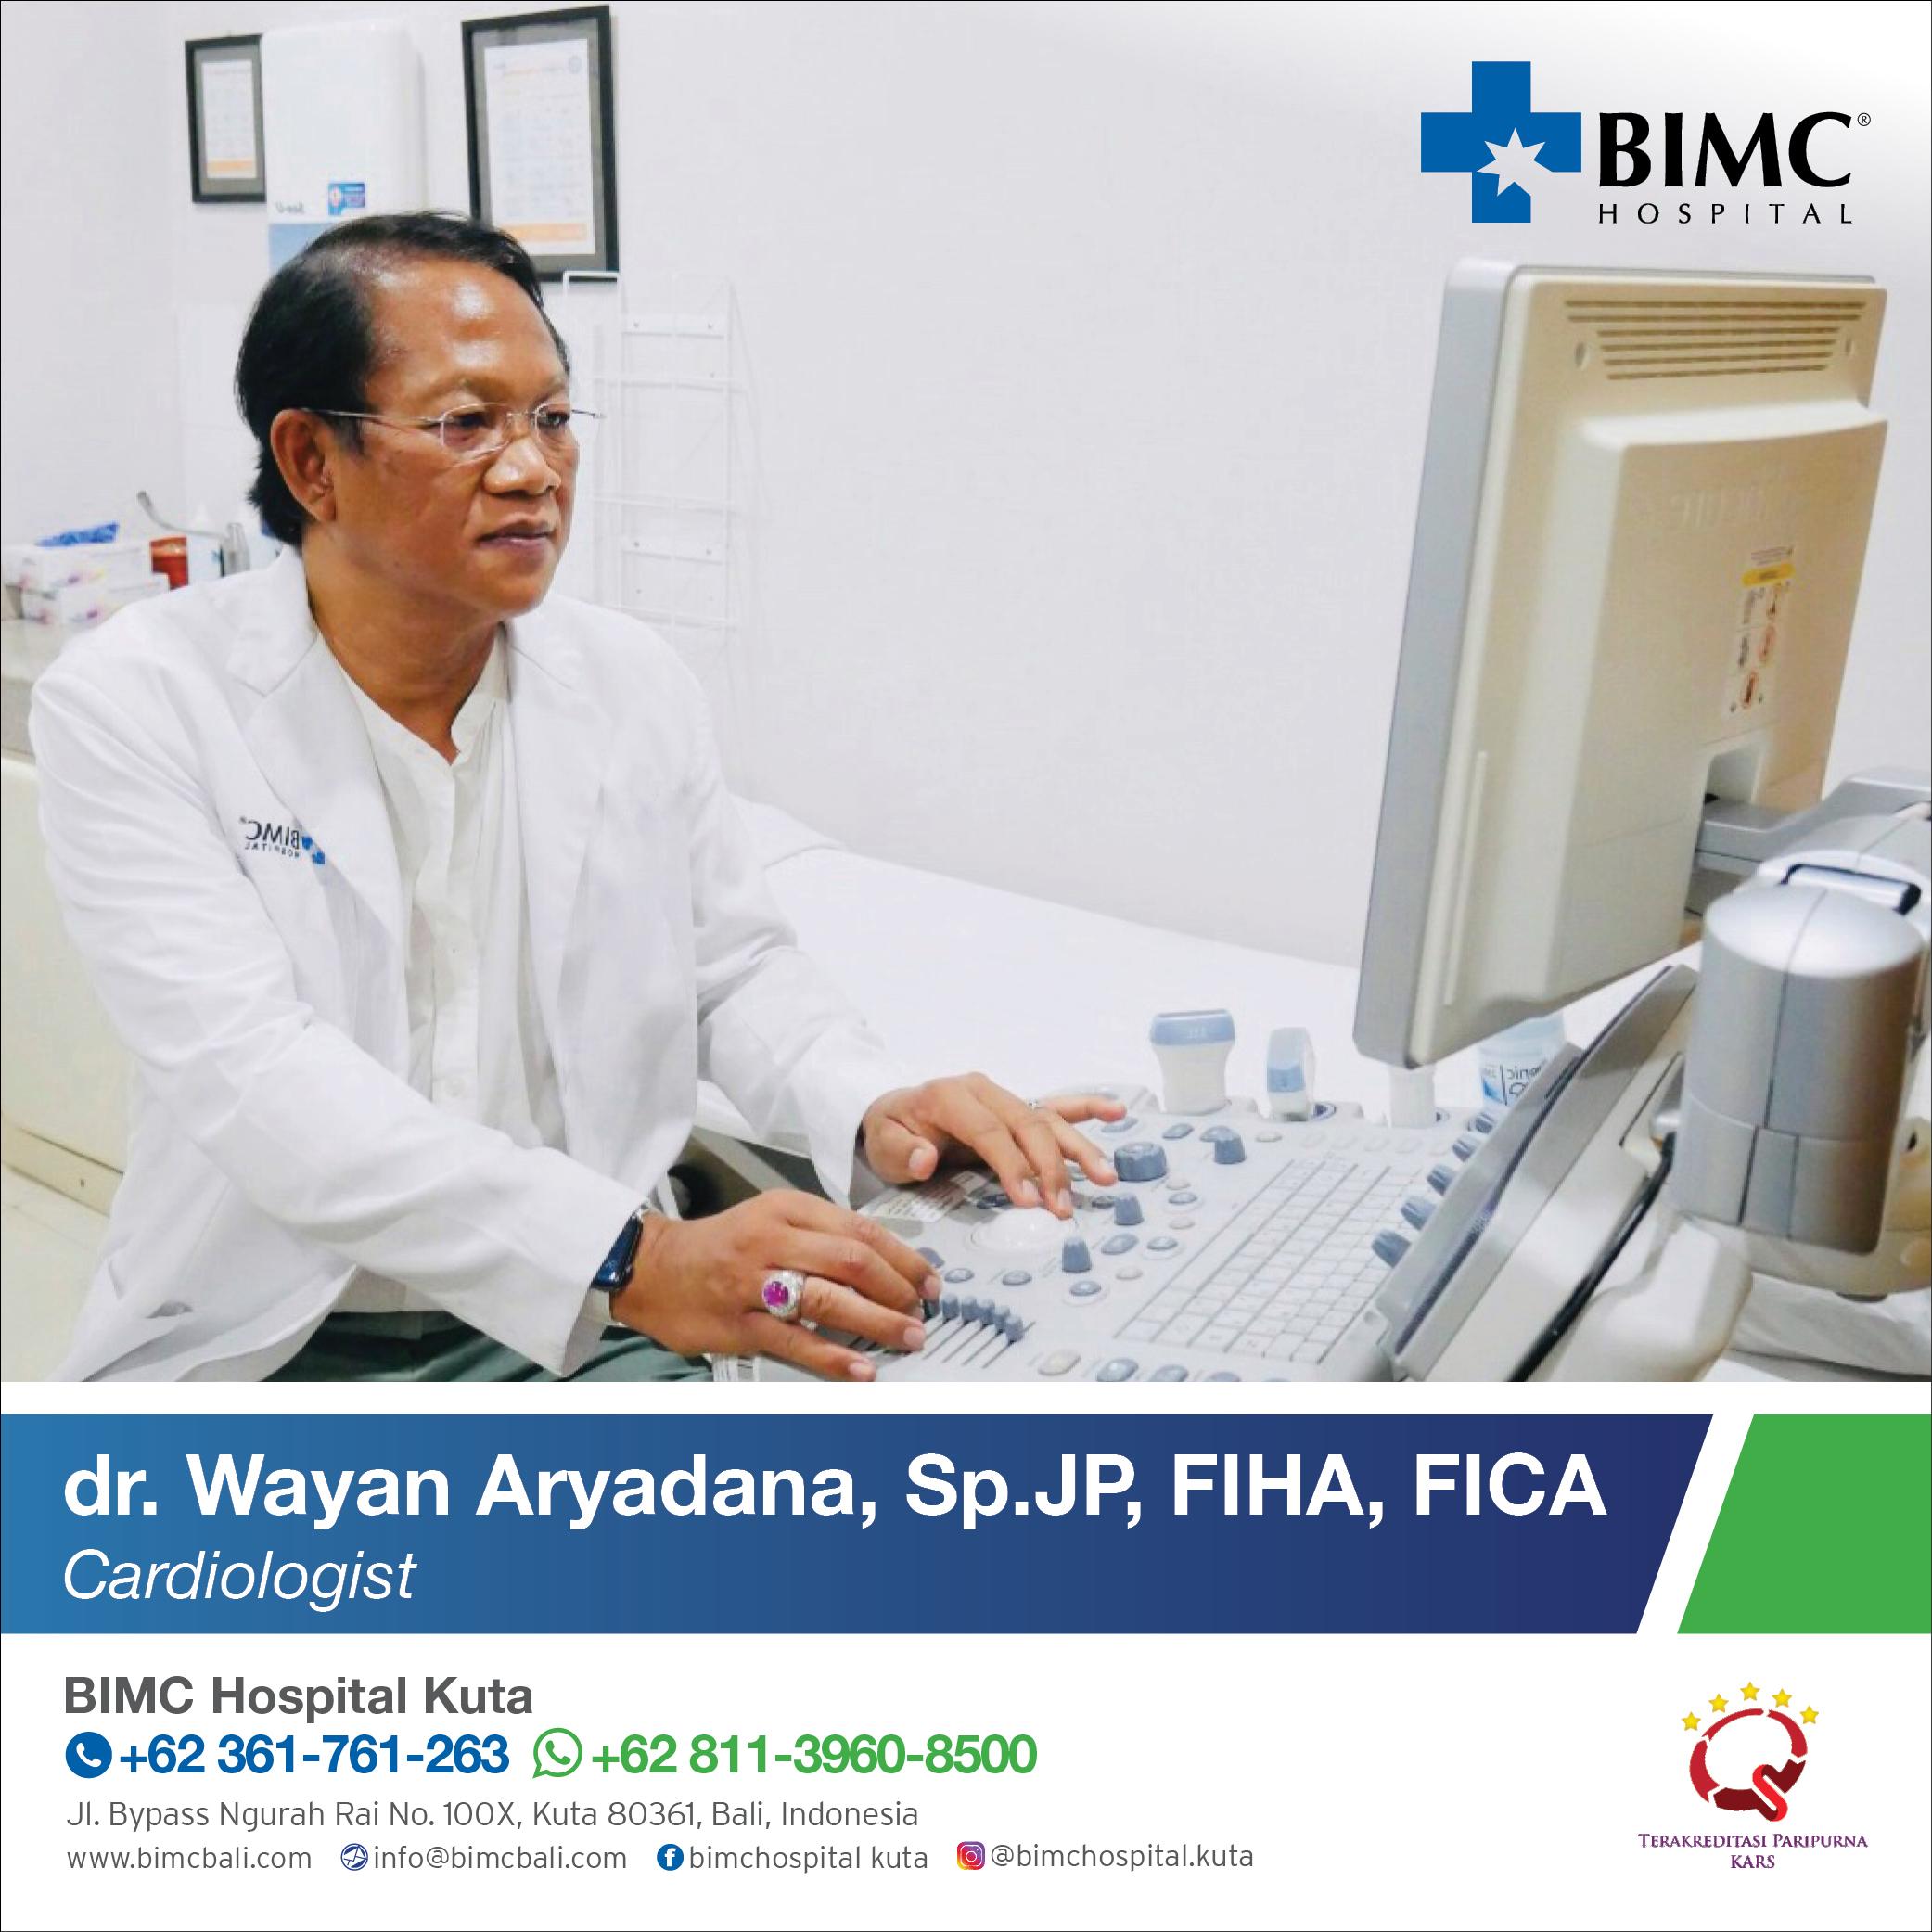 Dr. Aryadana